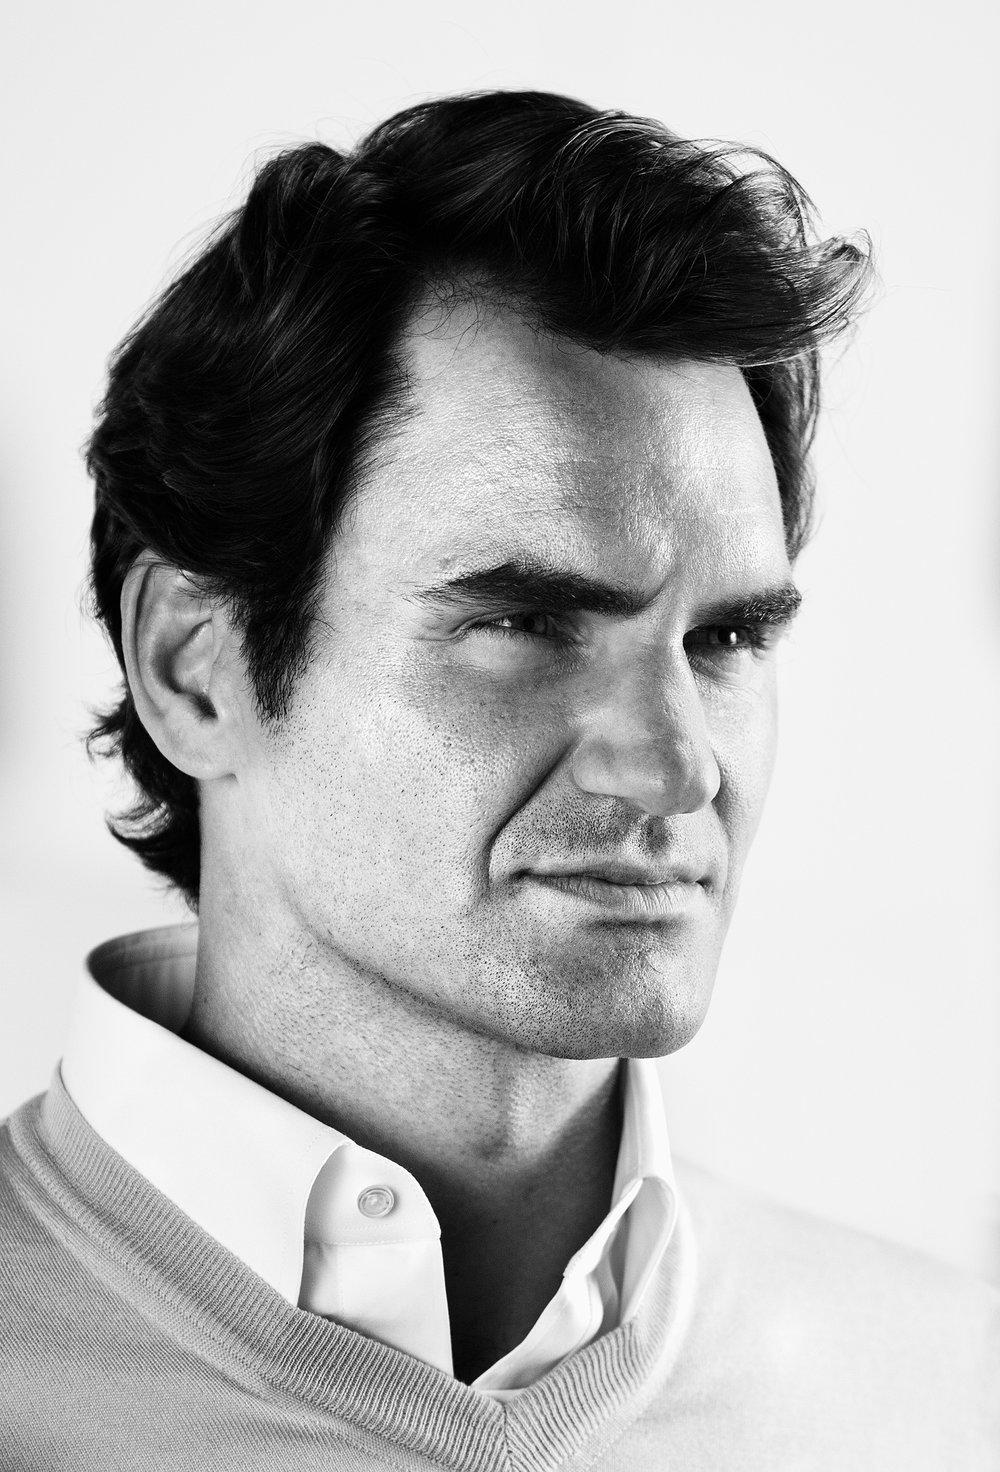 Roger-Federer-by-RemoBuess-2.jpg